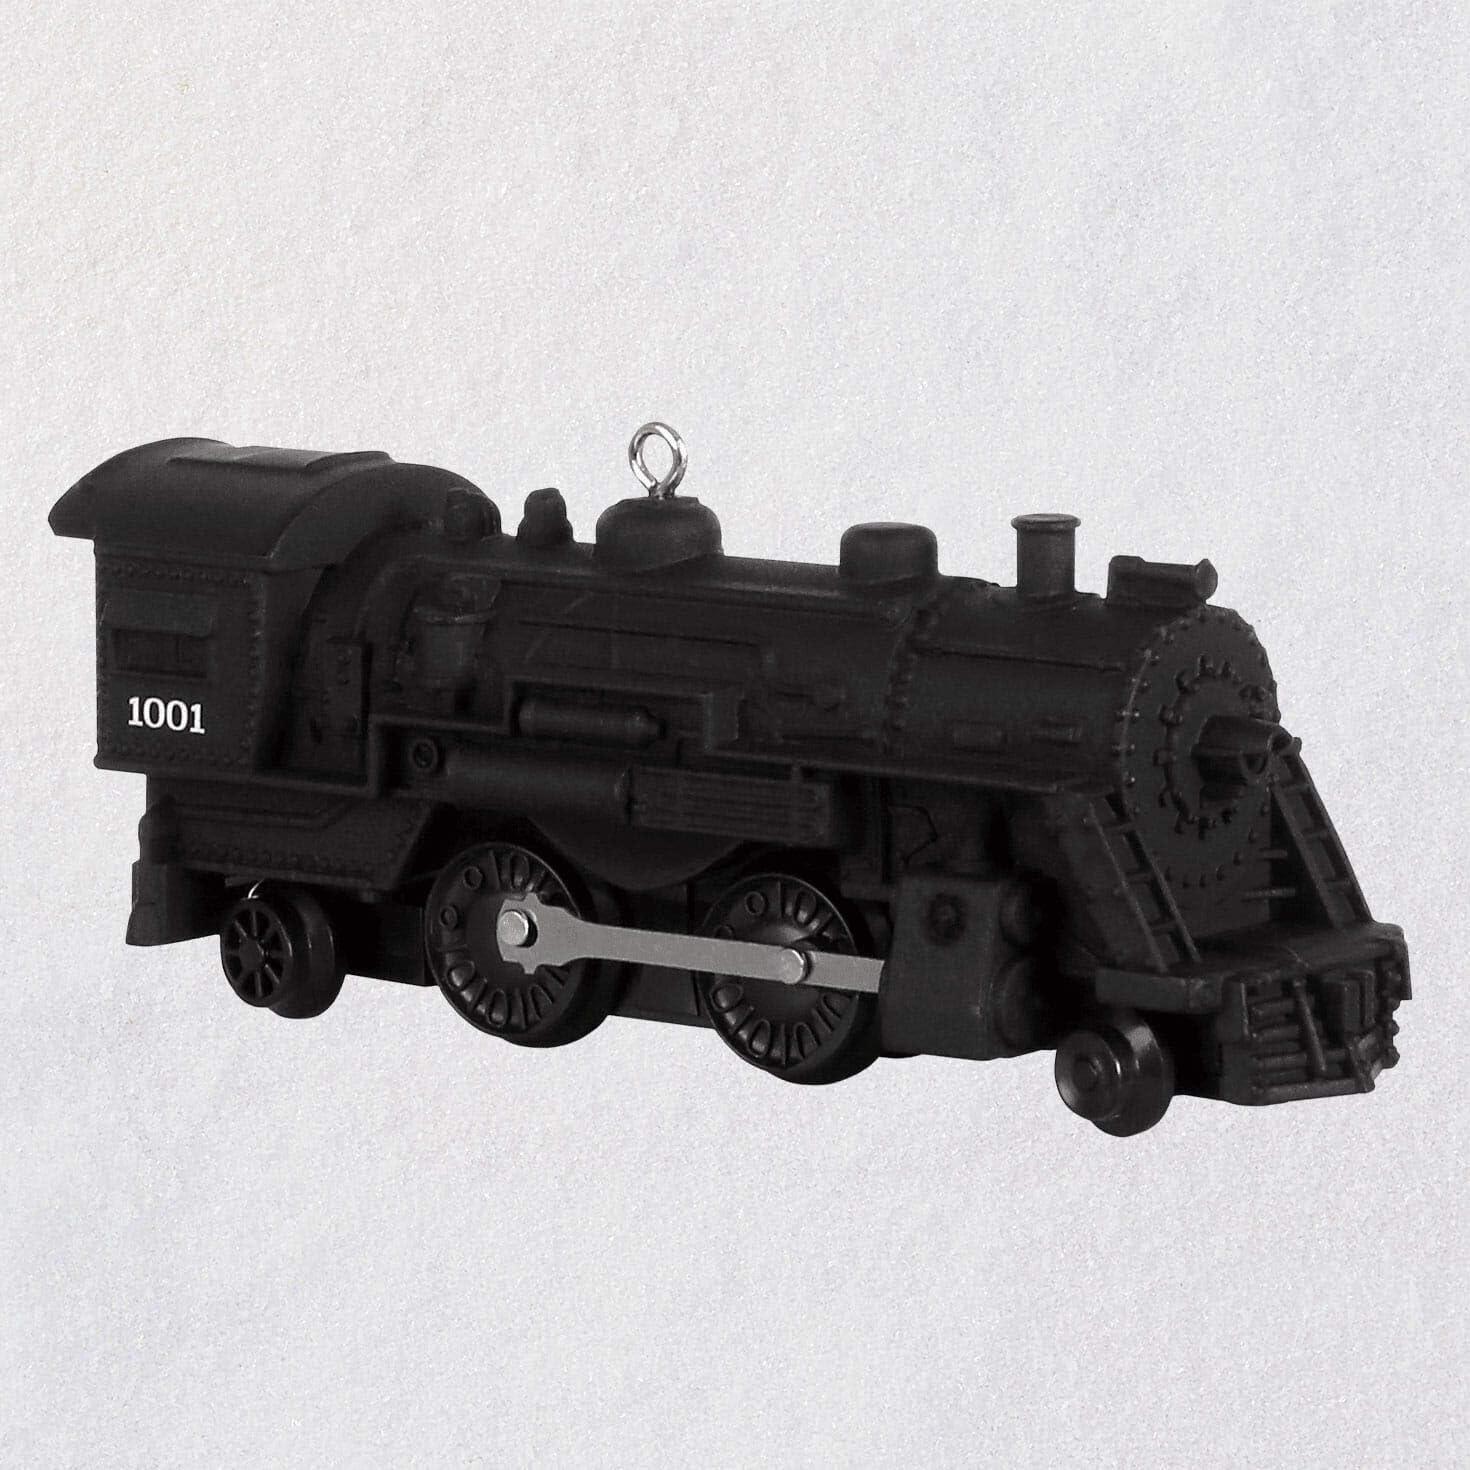 Hallmark Keepsake Christmas Ornament 2019 Year Dated Lionel Trains 1001 Scout Locomotive, Metal